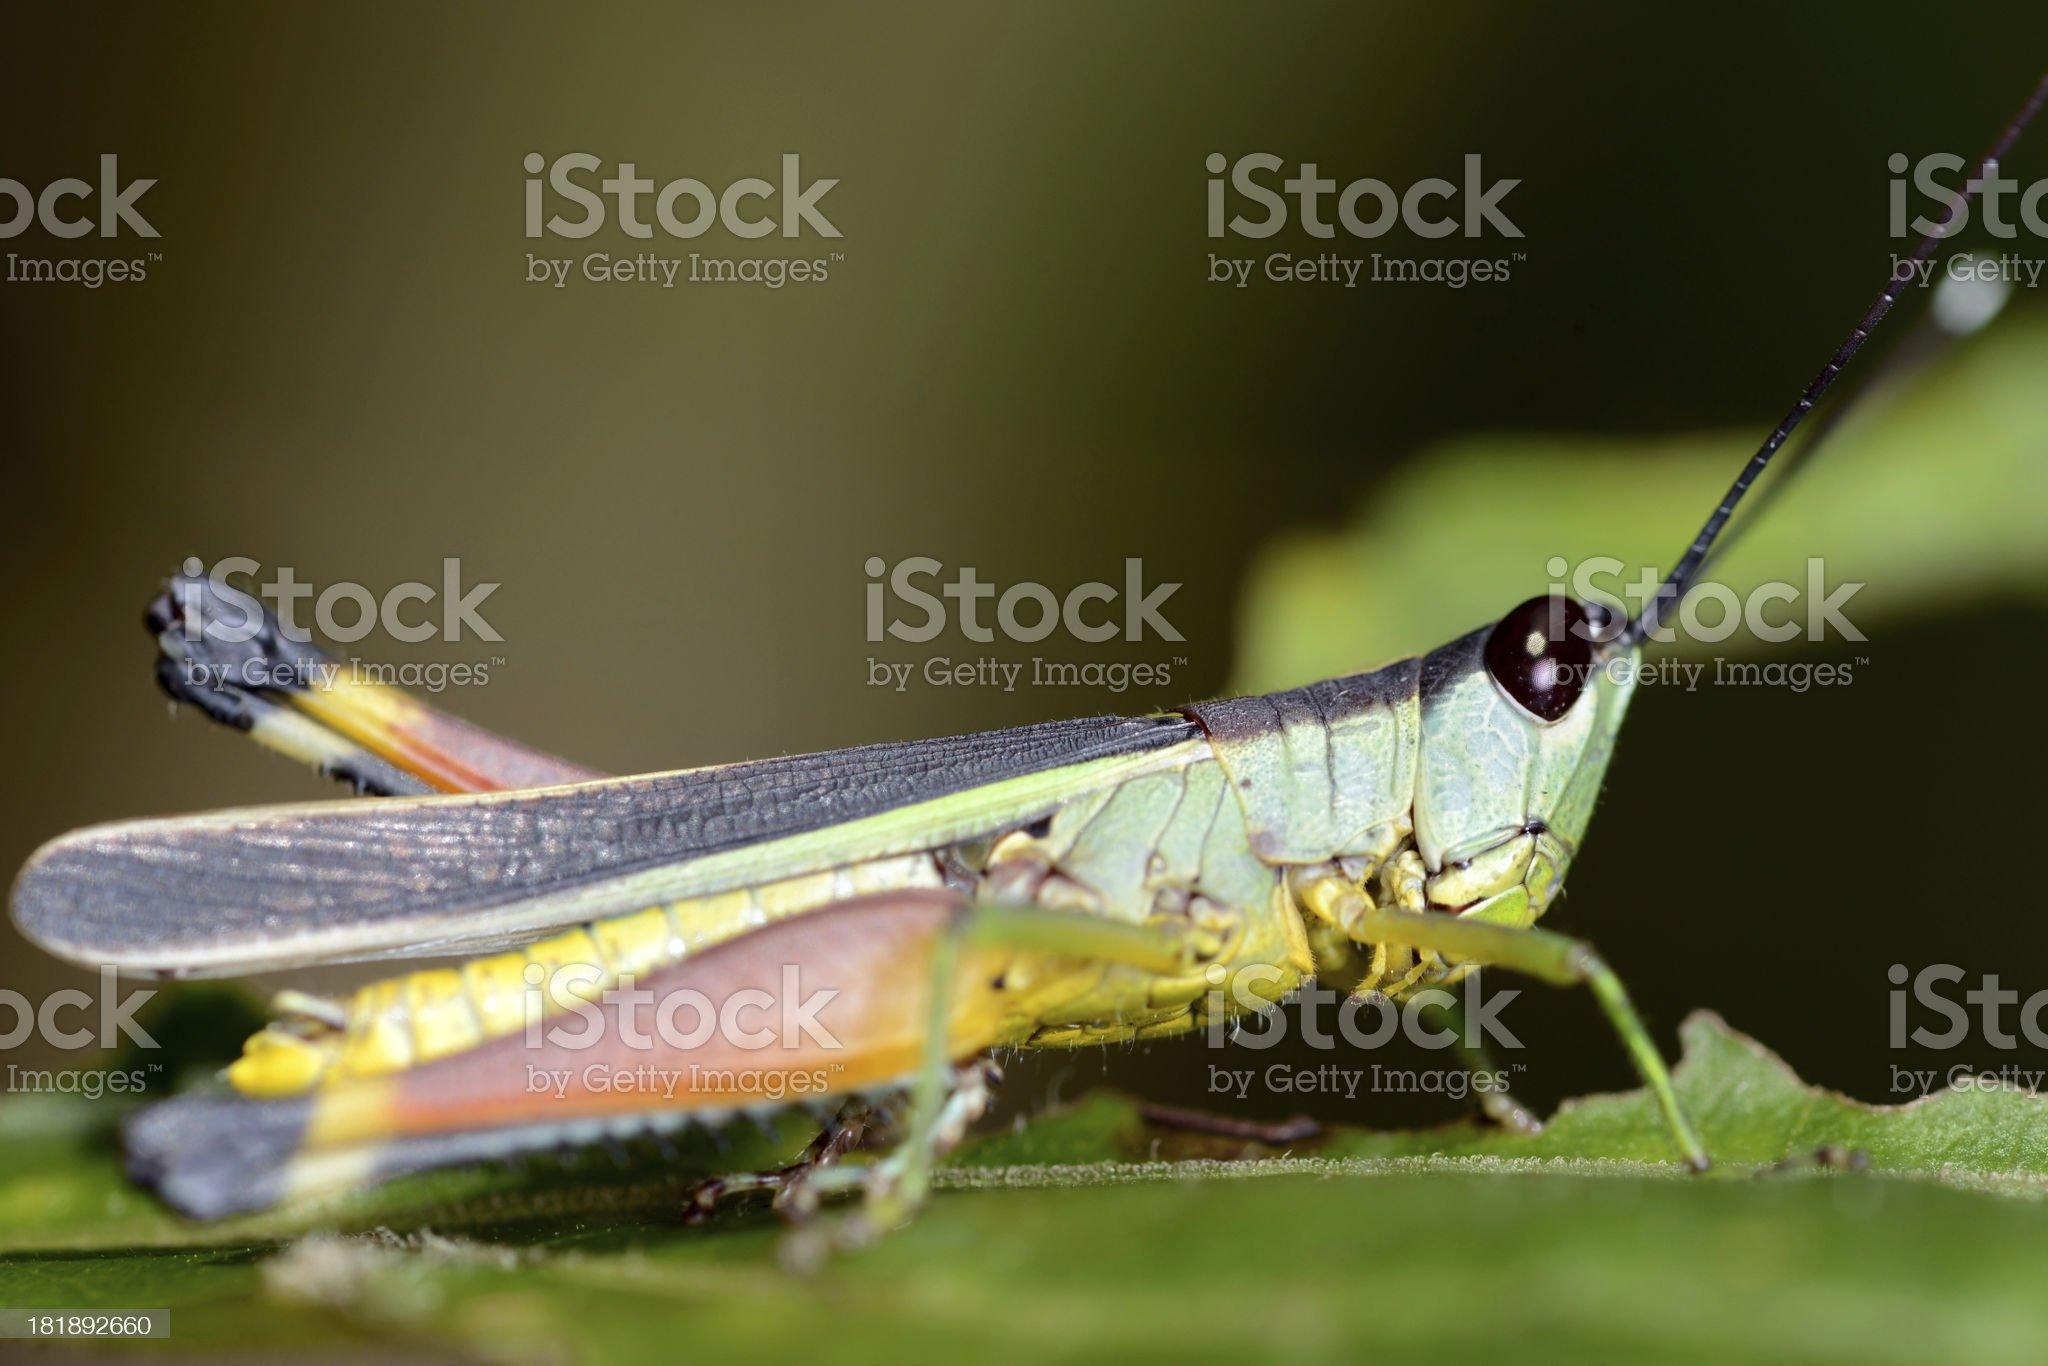 Grasshopper on the leaf royalty-free stock photo